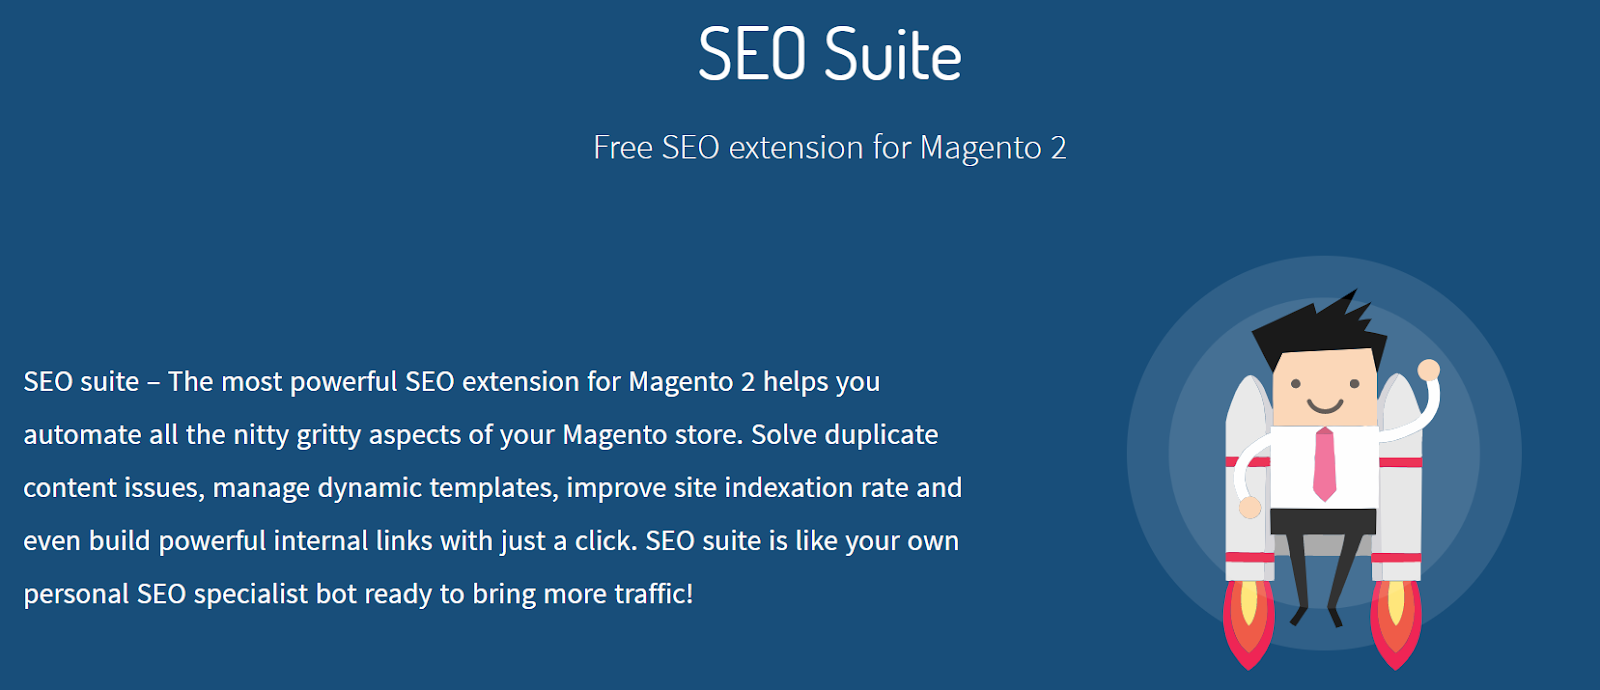 Emipro technology seo suite magento 2 free